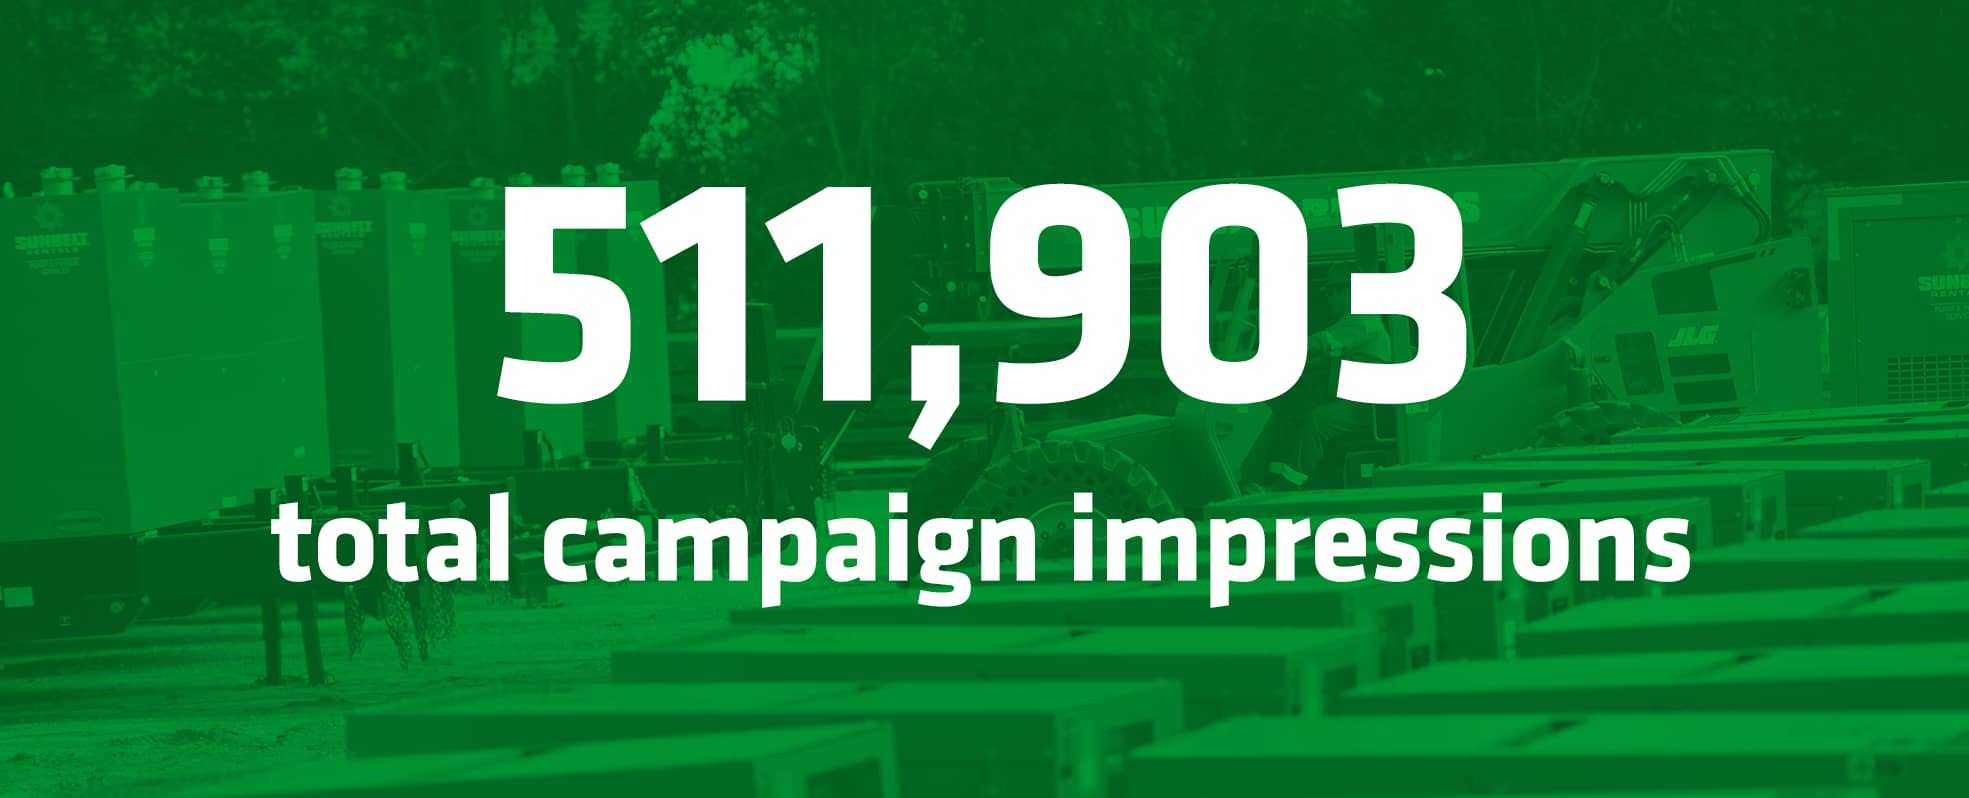 Sunbelt results 511,903 total campaign impressions